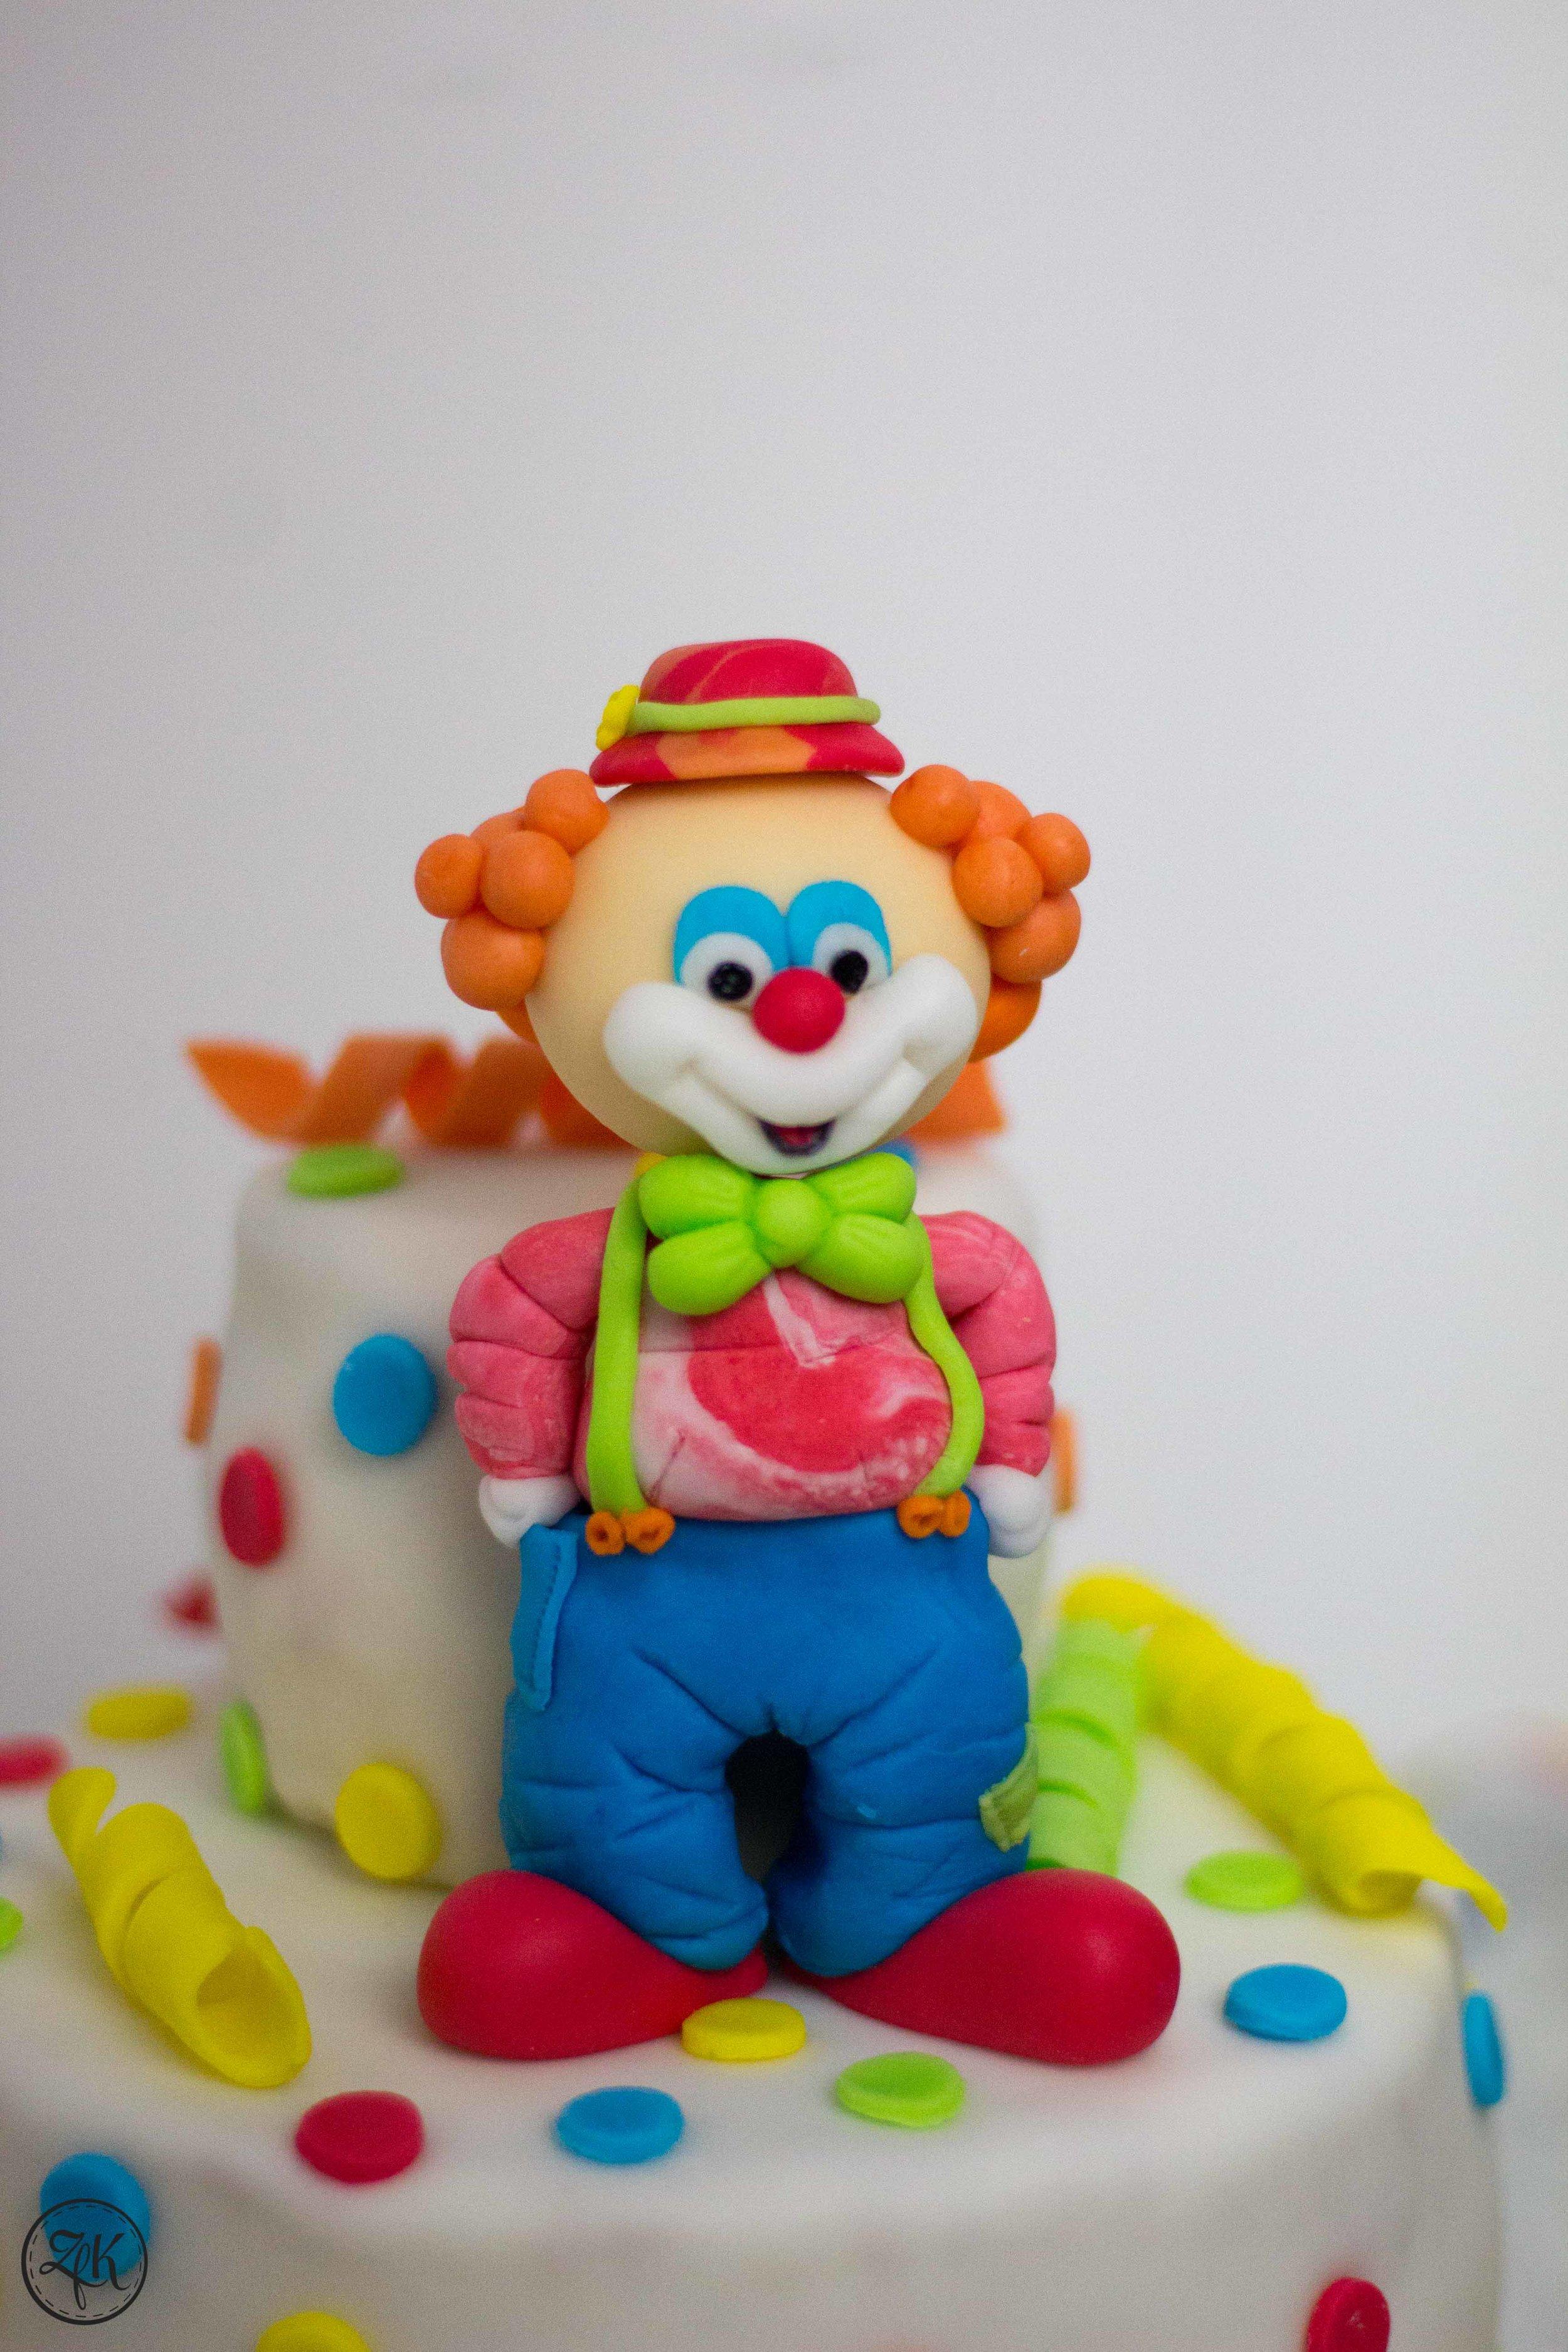 ZfK_Clown_Torte_05